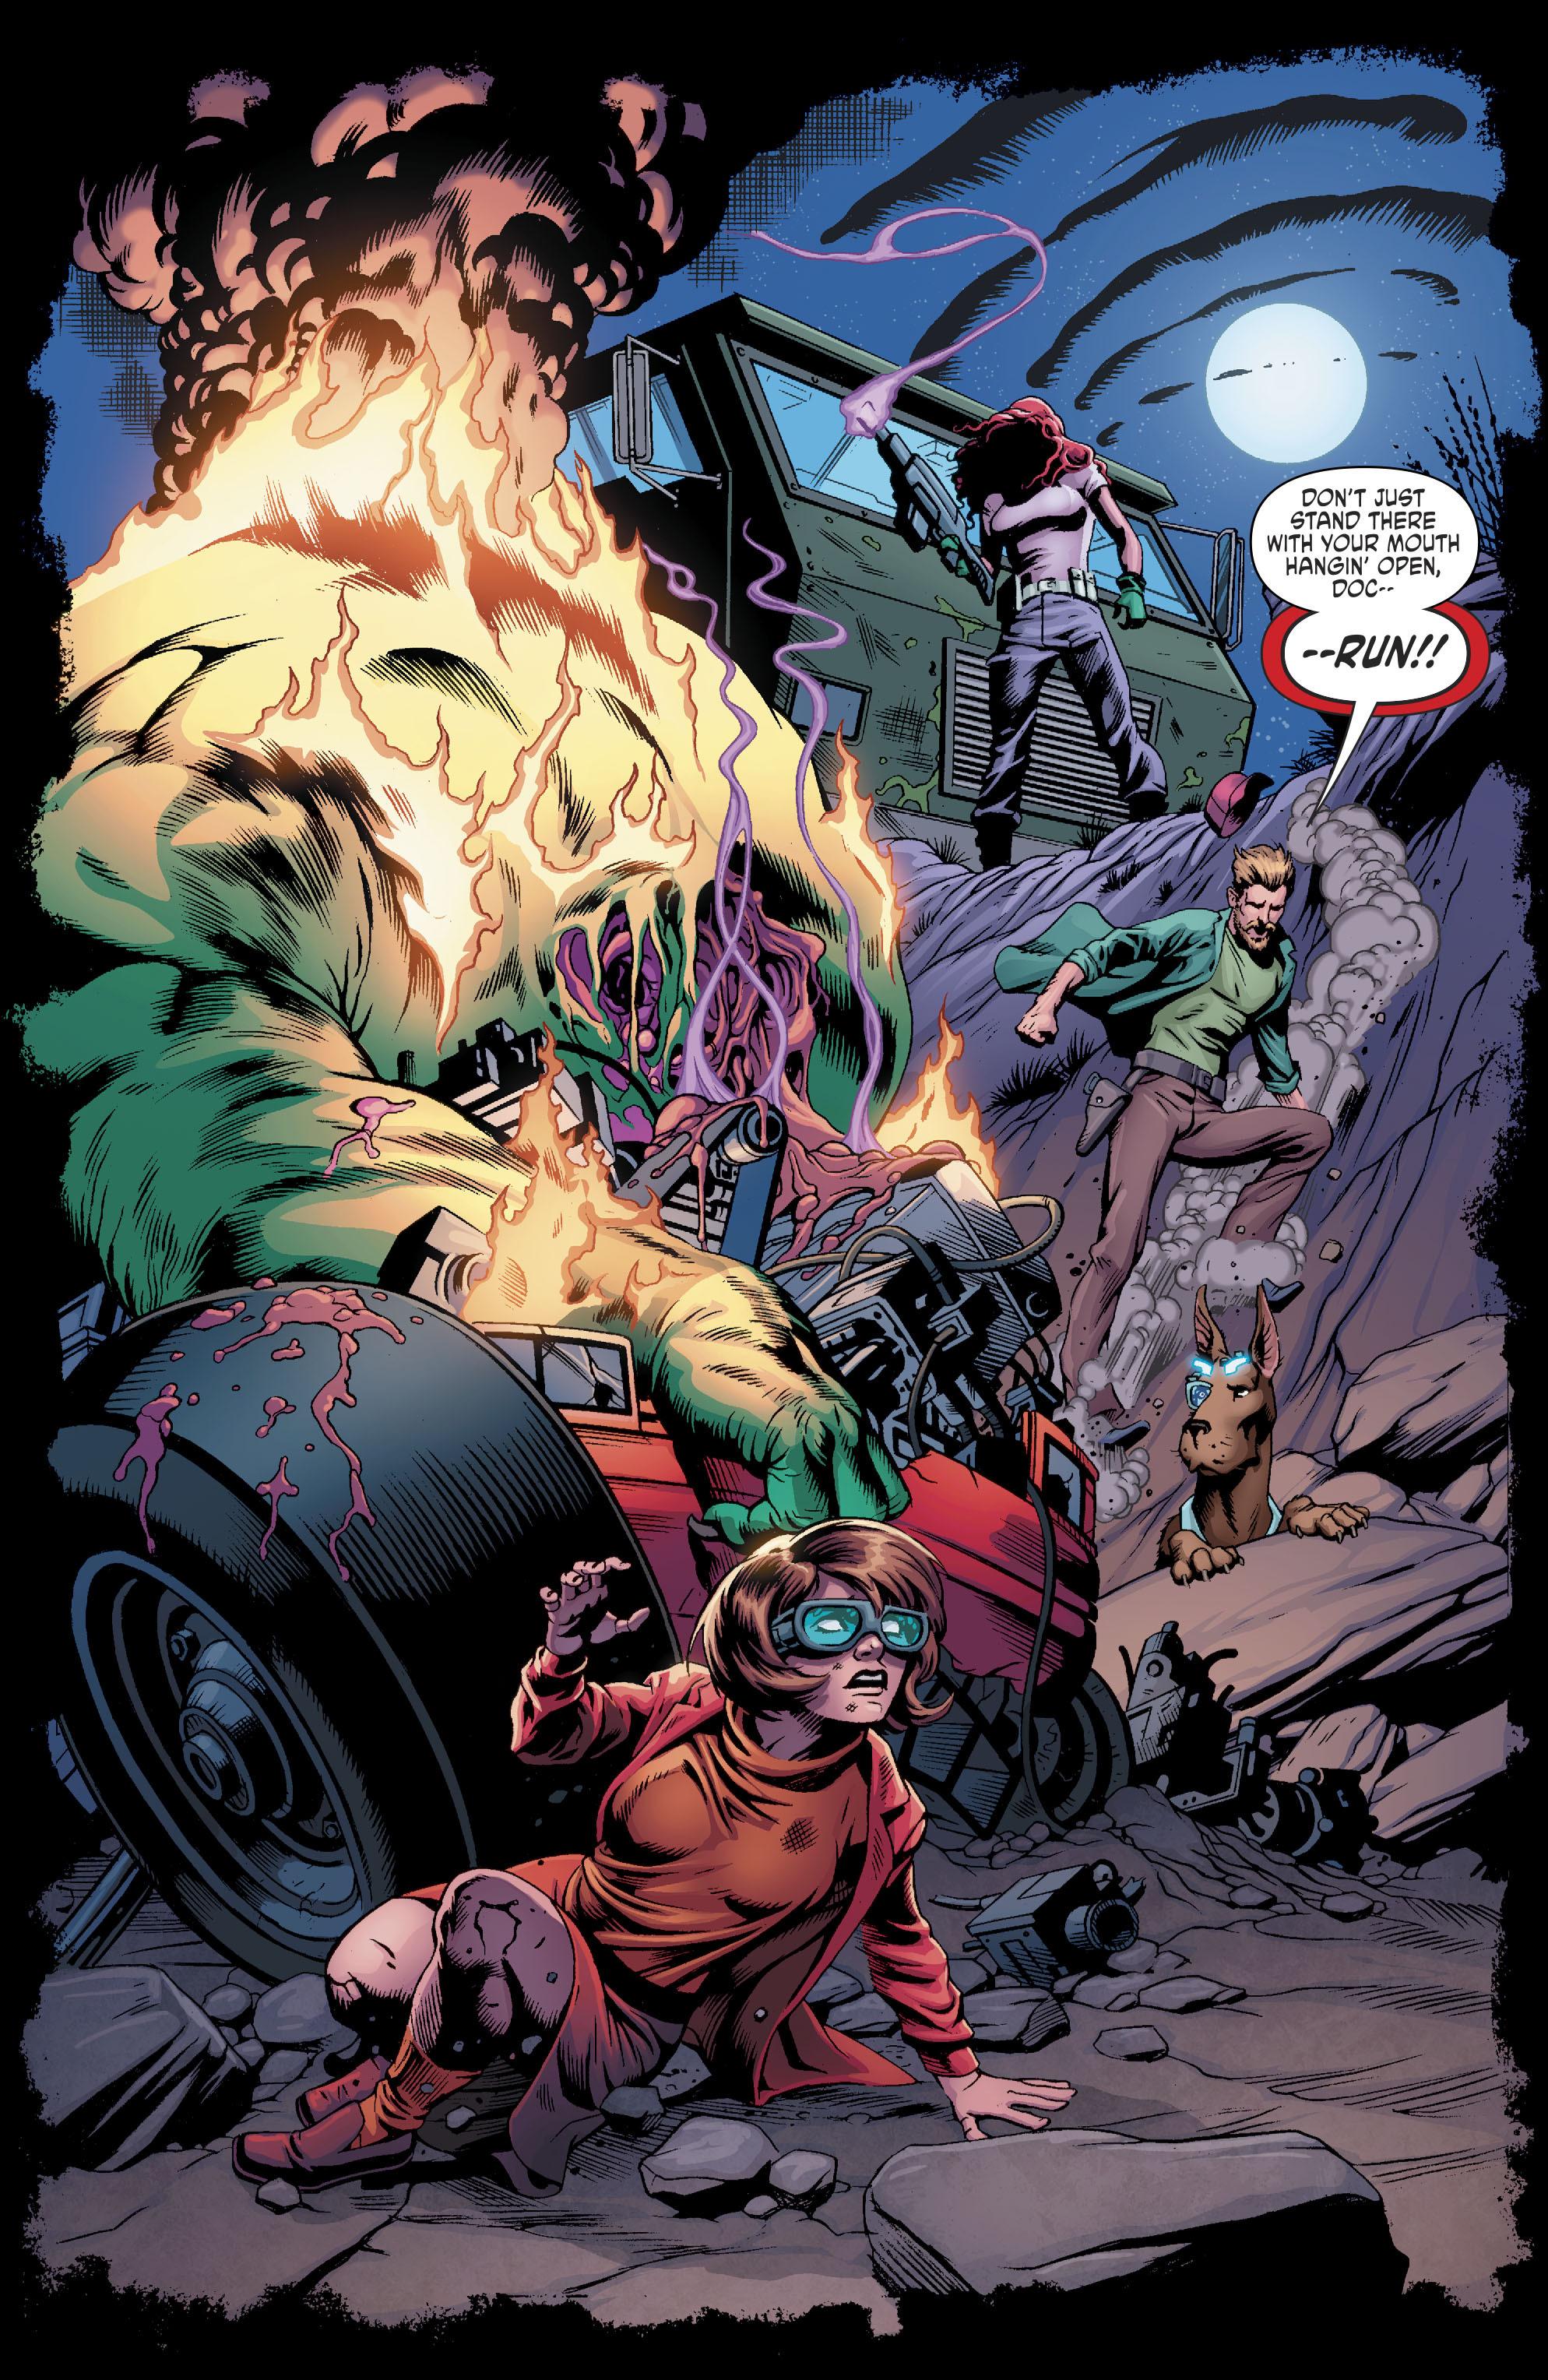 Read online Scooby Apocalypse comic -  Issue #11 - 17